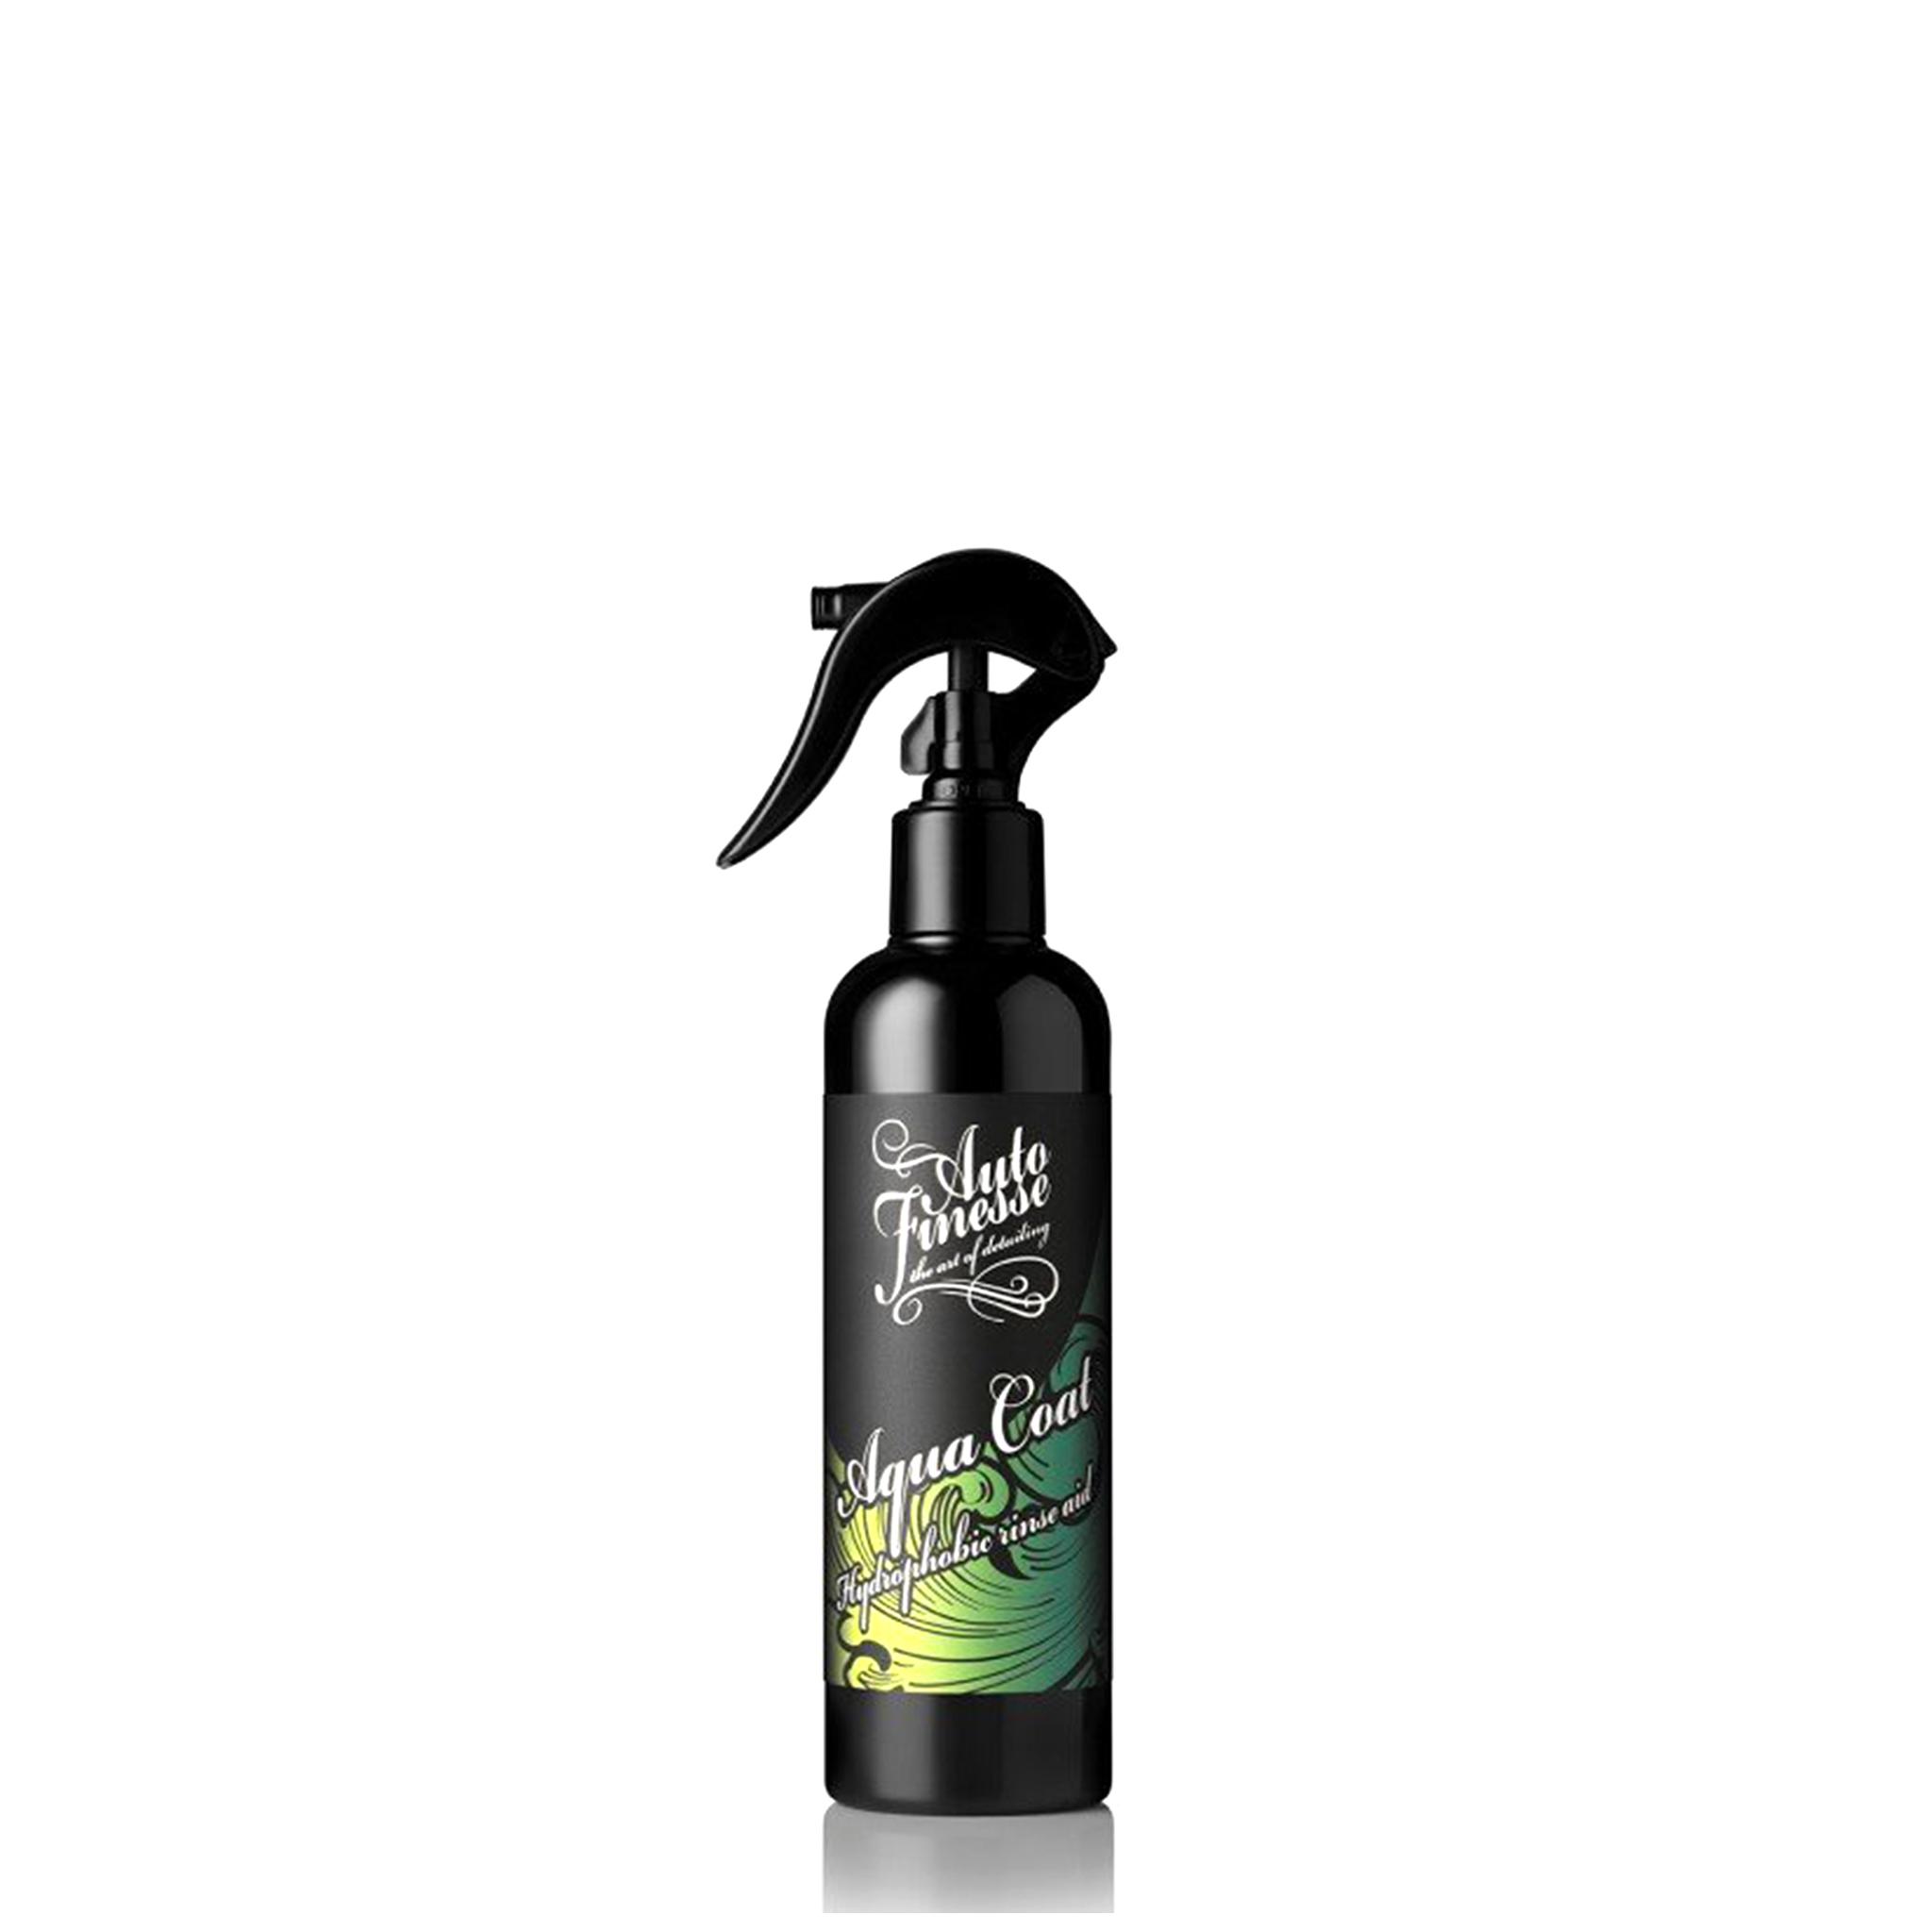 Snabbförsegling Auto Finesse Aqua Coat, 250 ml / Spray